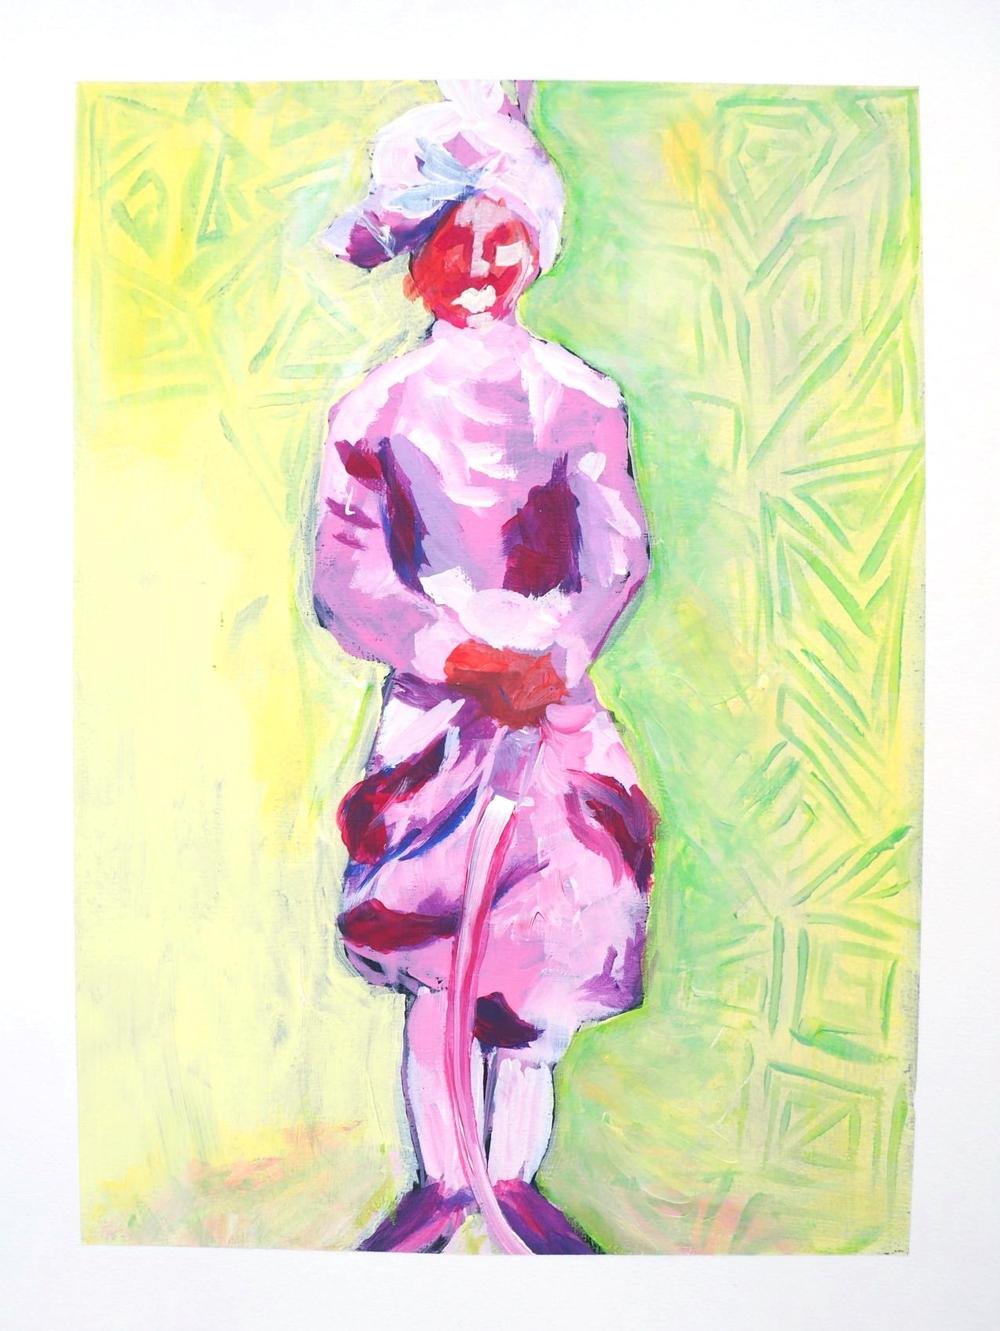 Pink Maharaja,20 3/4 x 18 3/4, acrylic on paper, $150